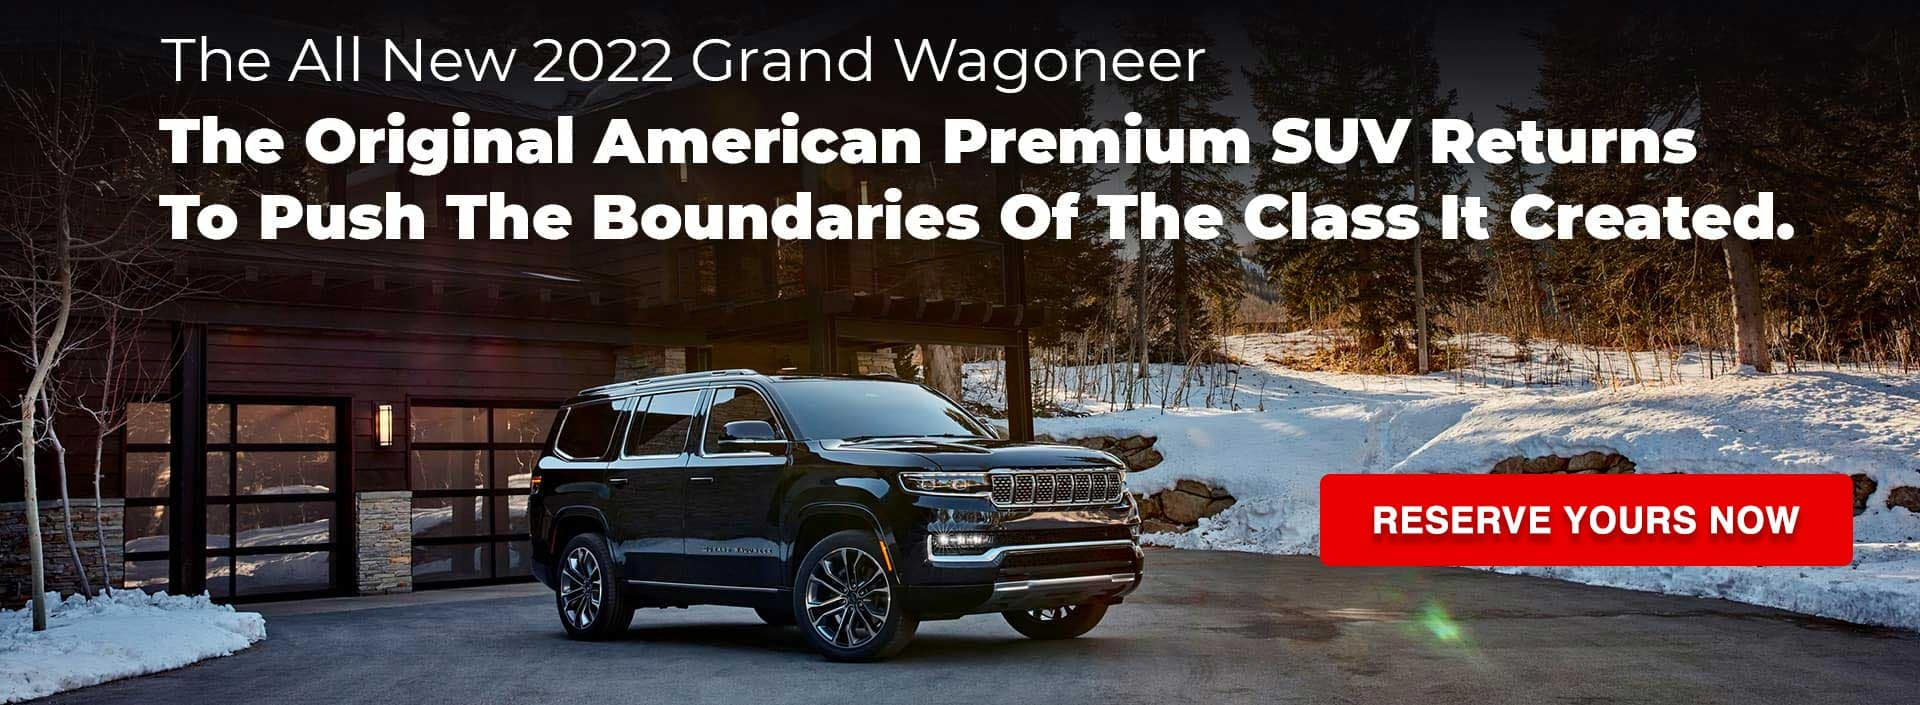 Wagoneer-Updated-CTA